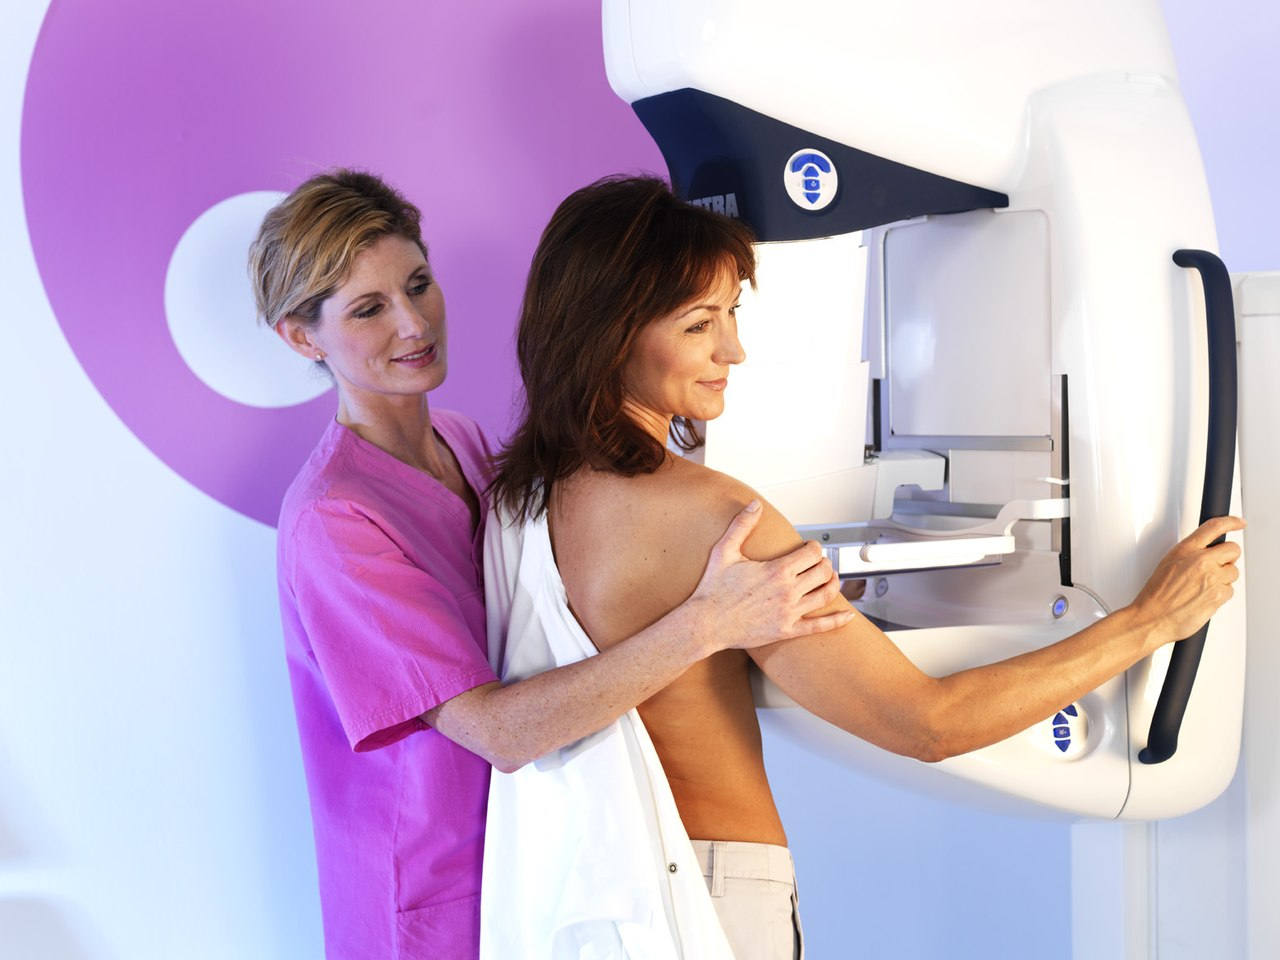 статистика рецидива рака молочной железы